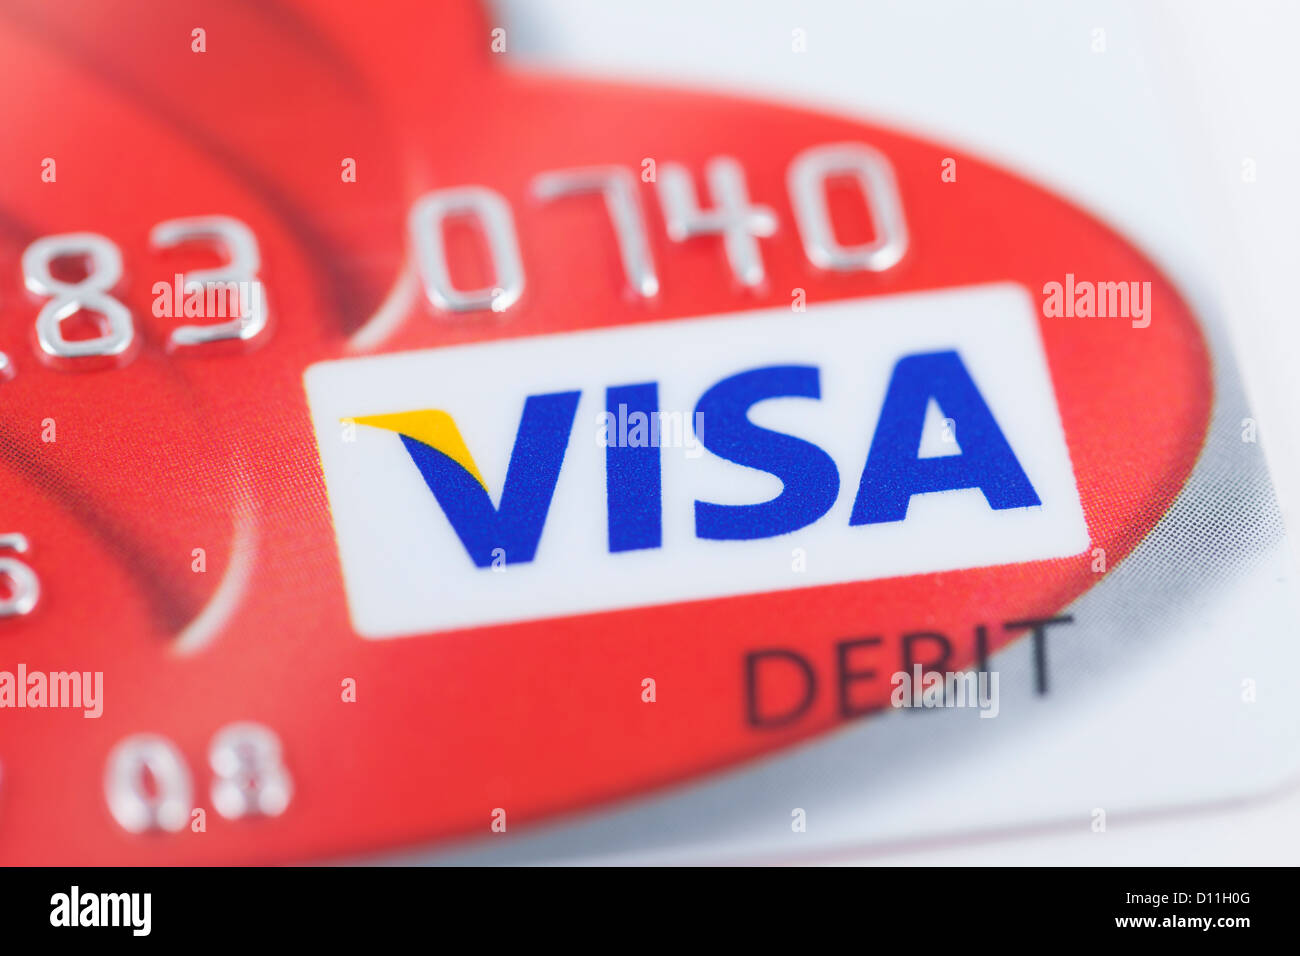 Visa card logo close up - Stock Image